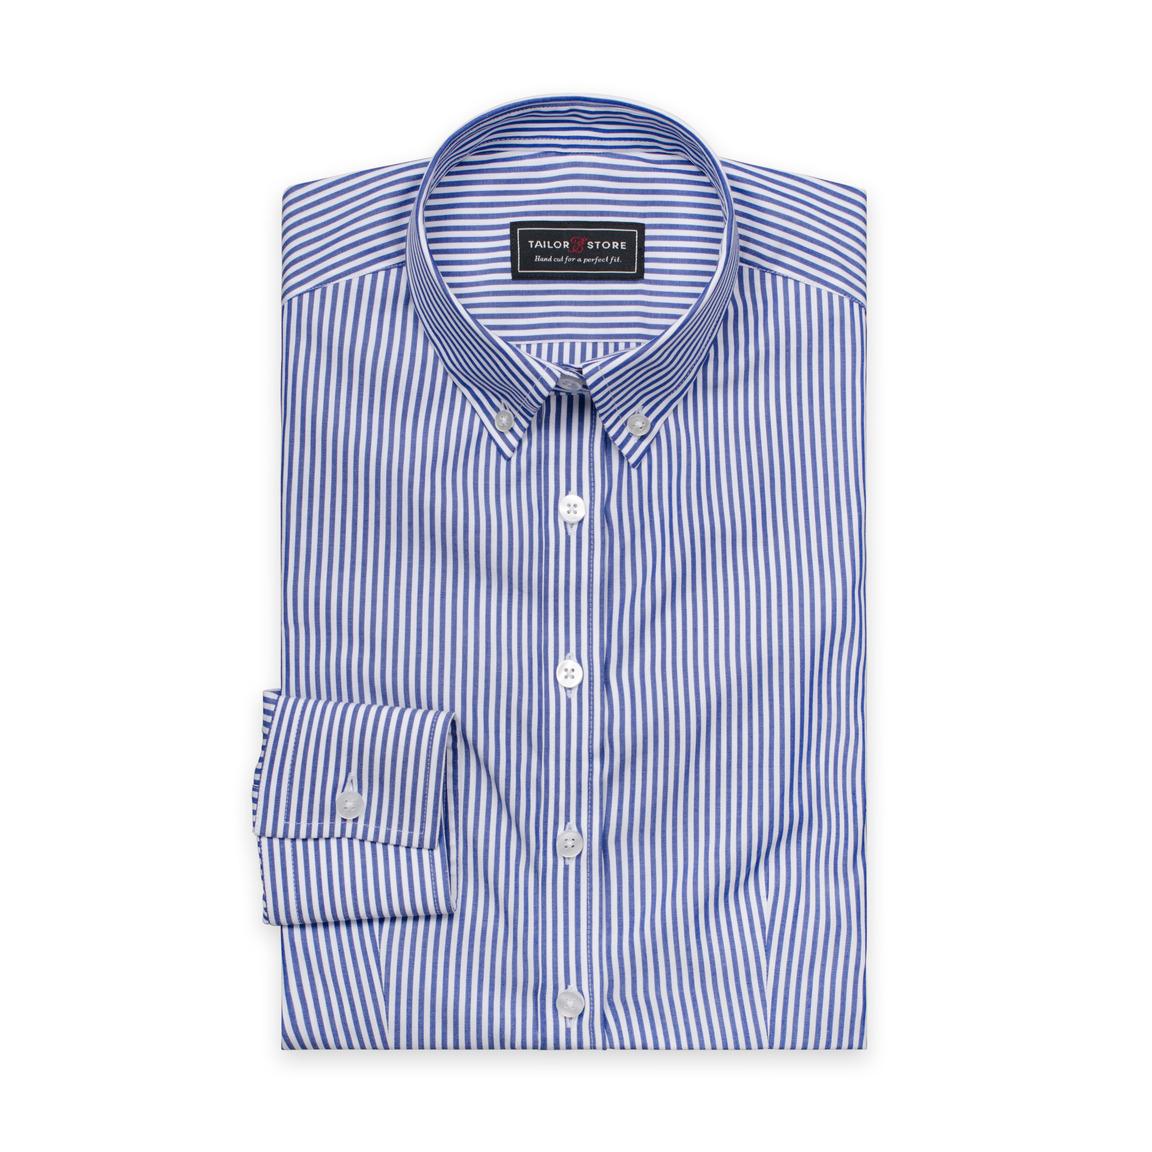 Dark blue striped poplin shirt